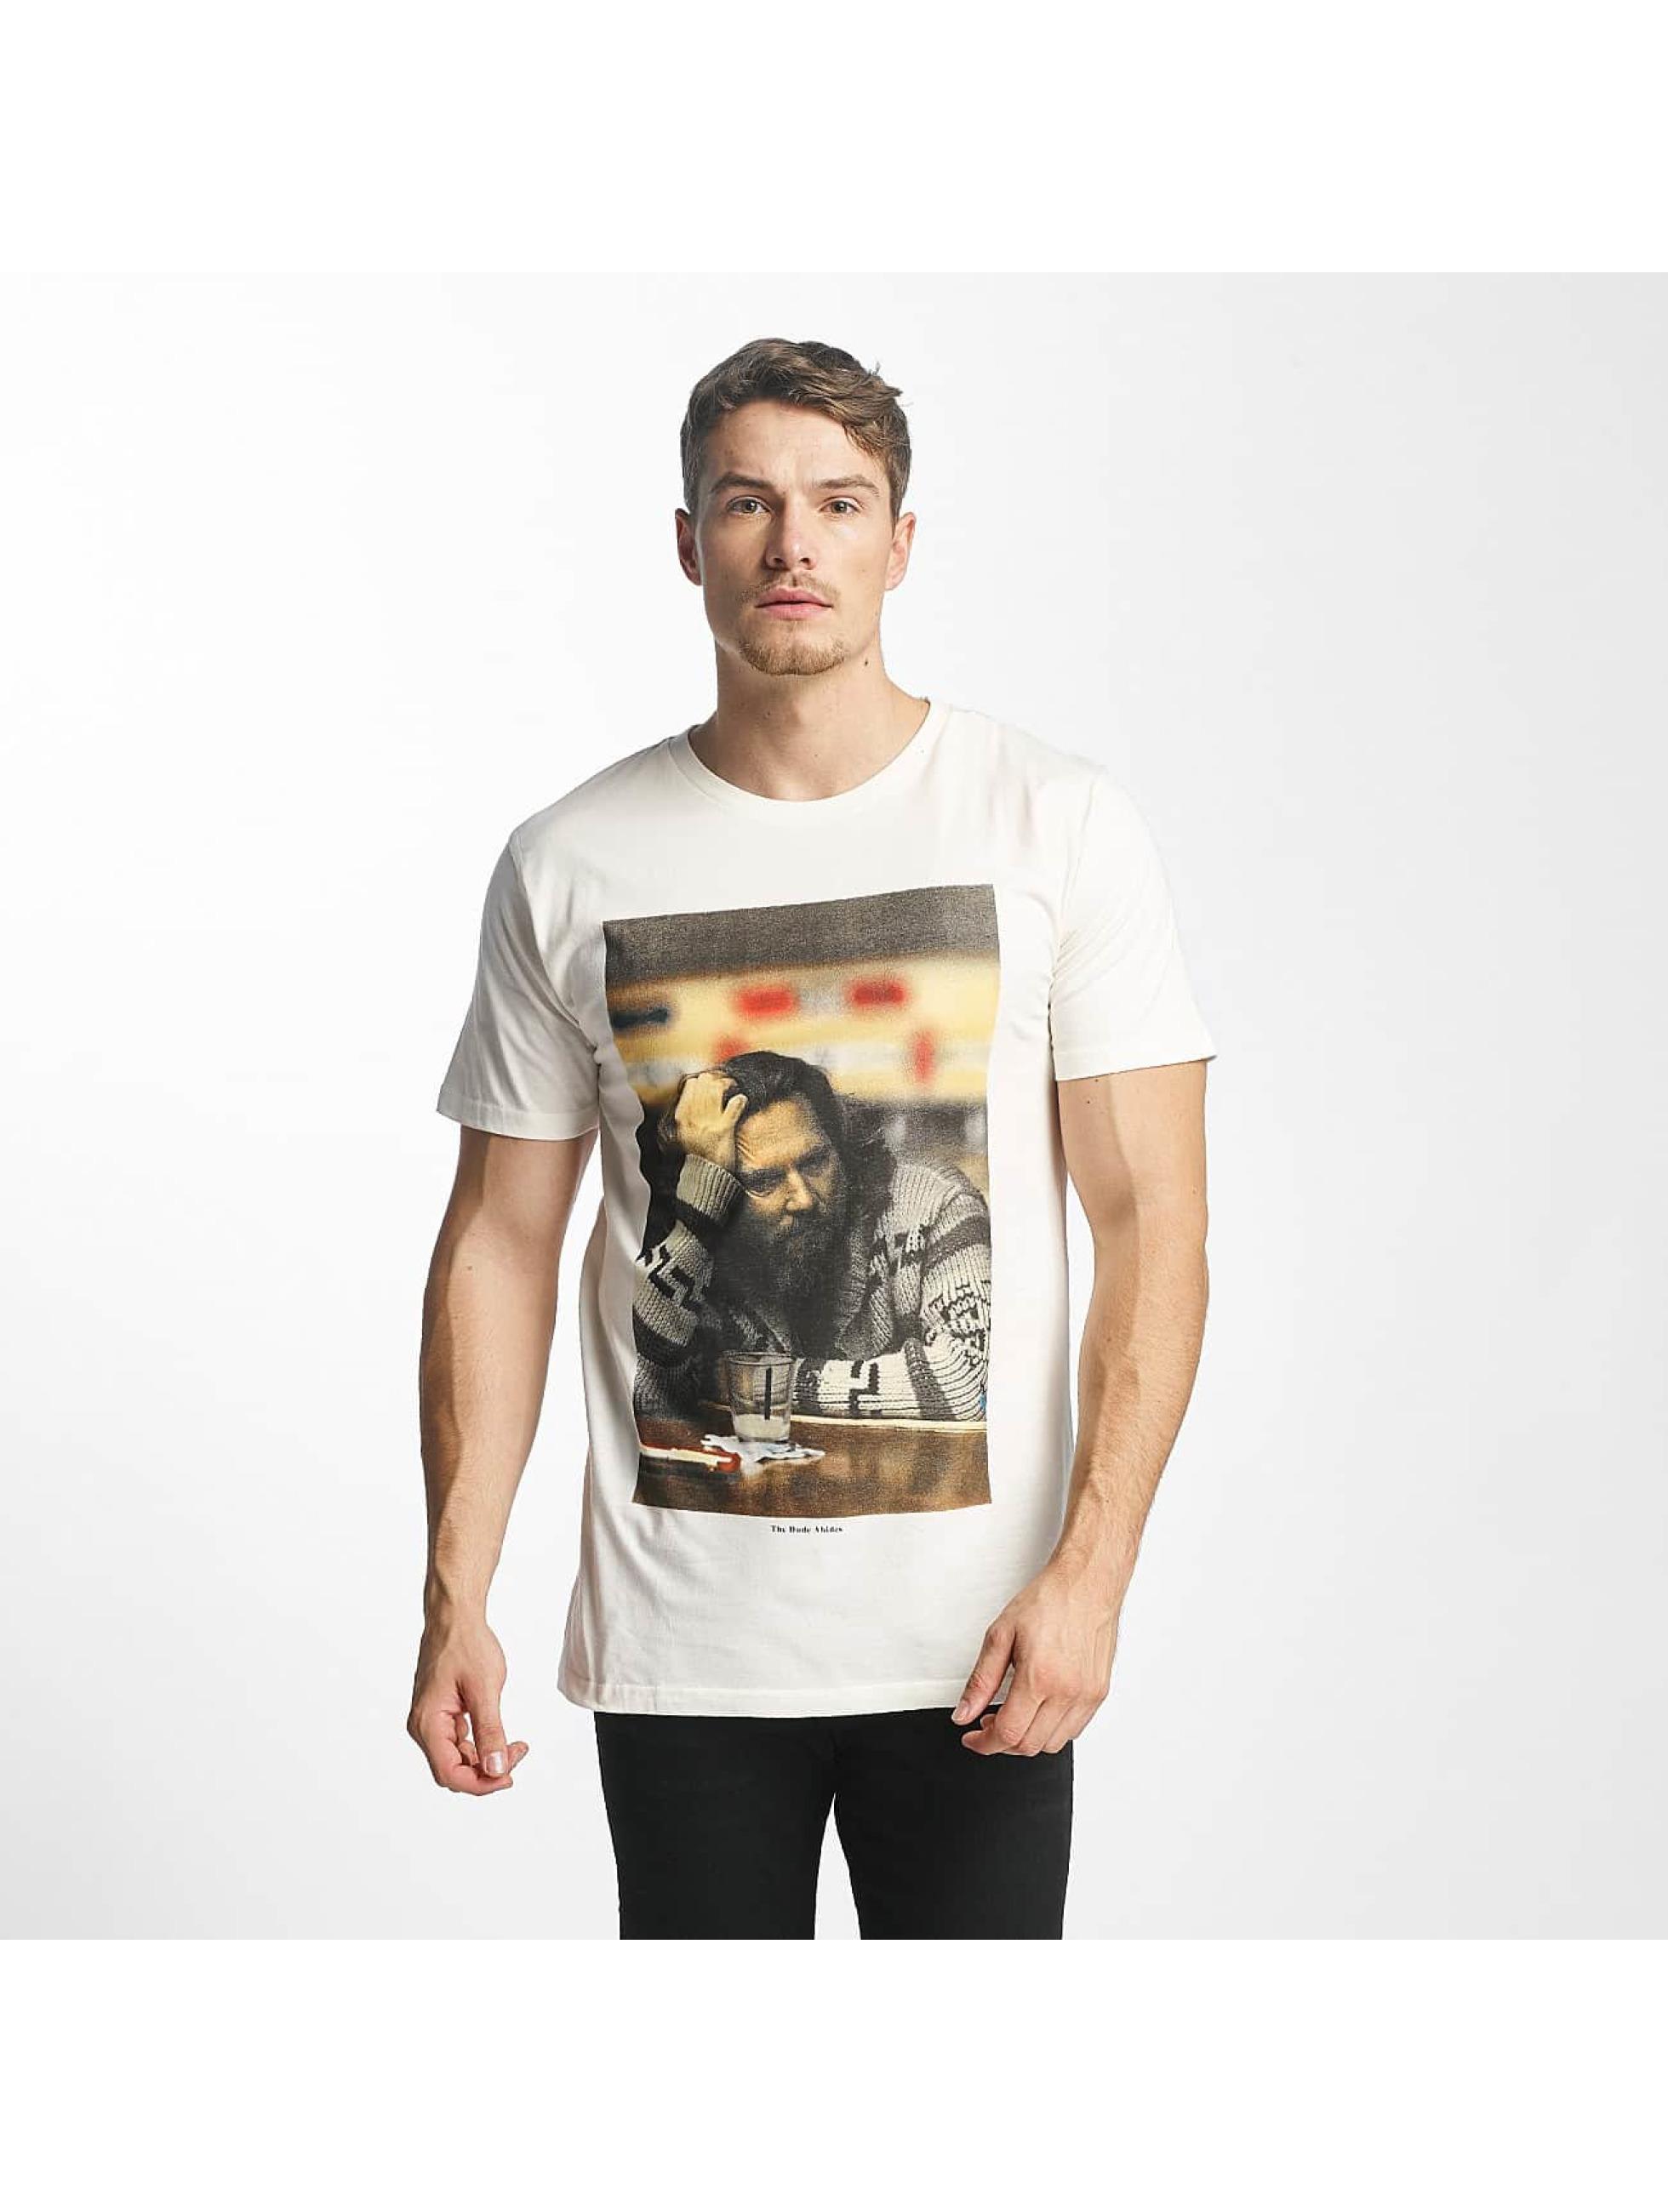 DEDICATED Männer T-Shirt The Dude in weiß